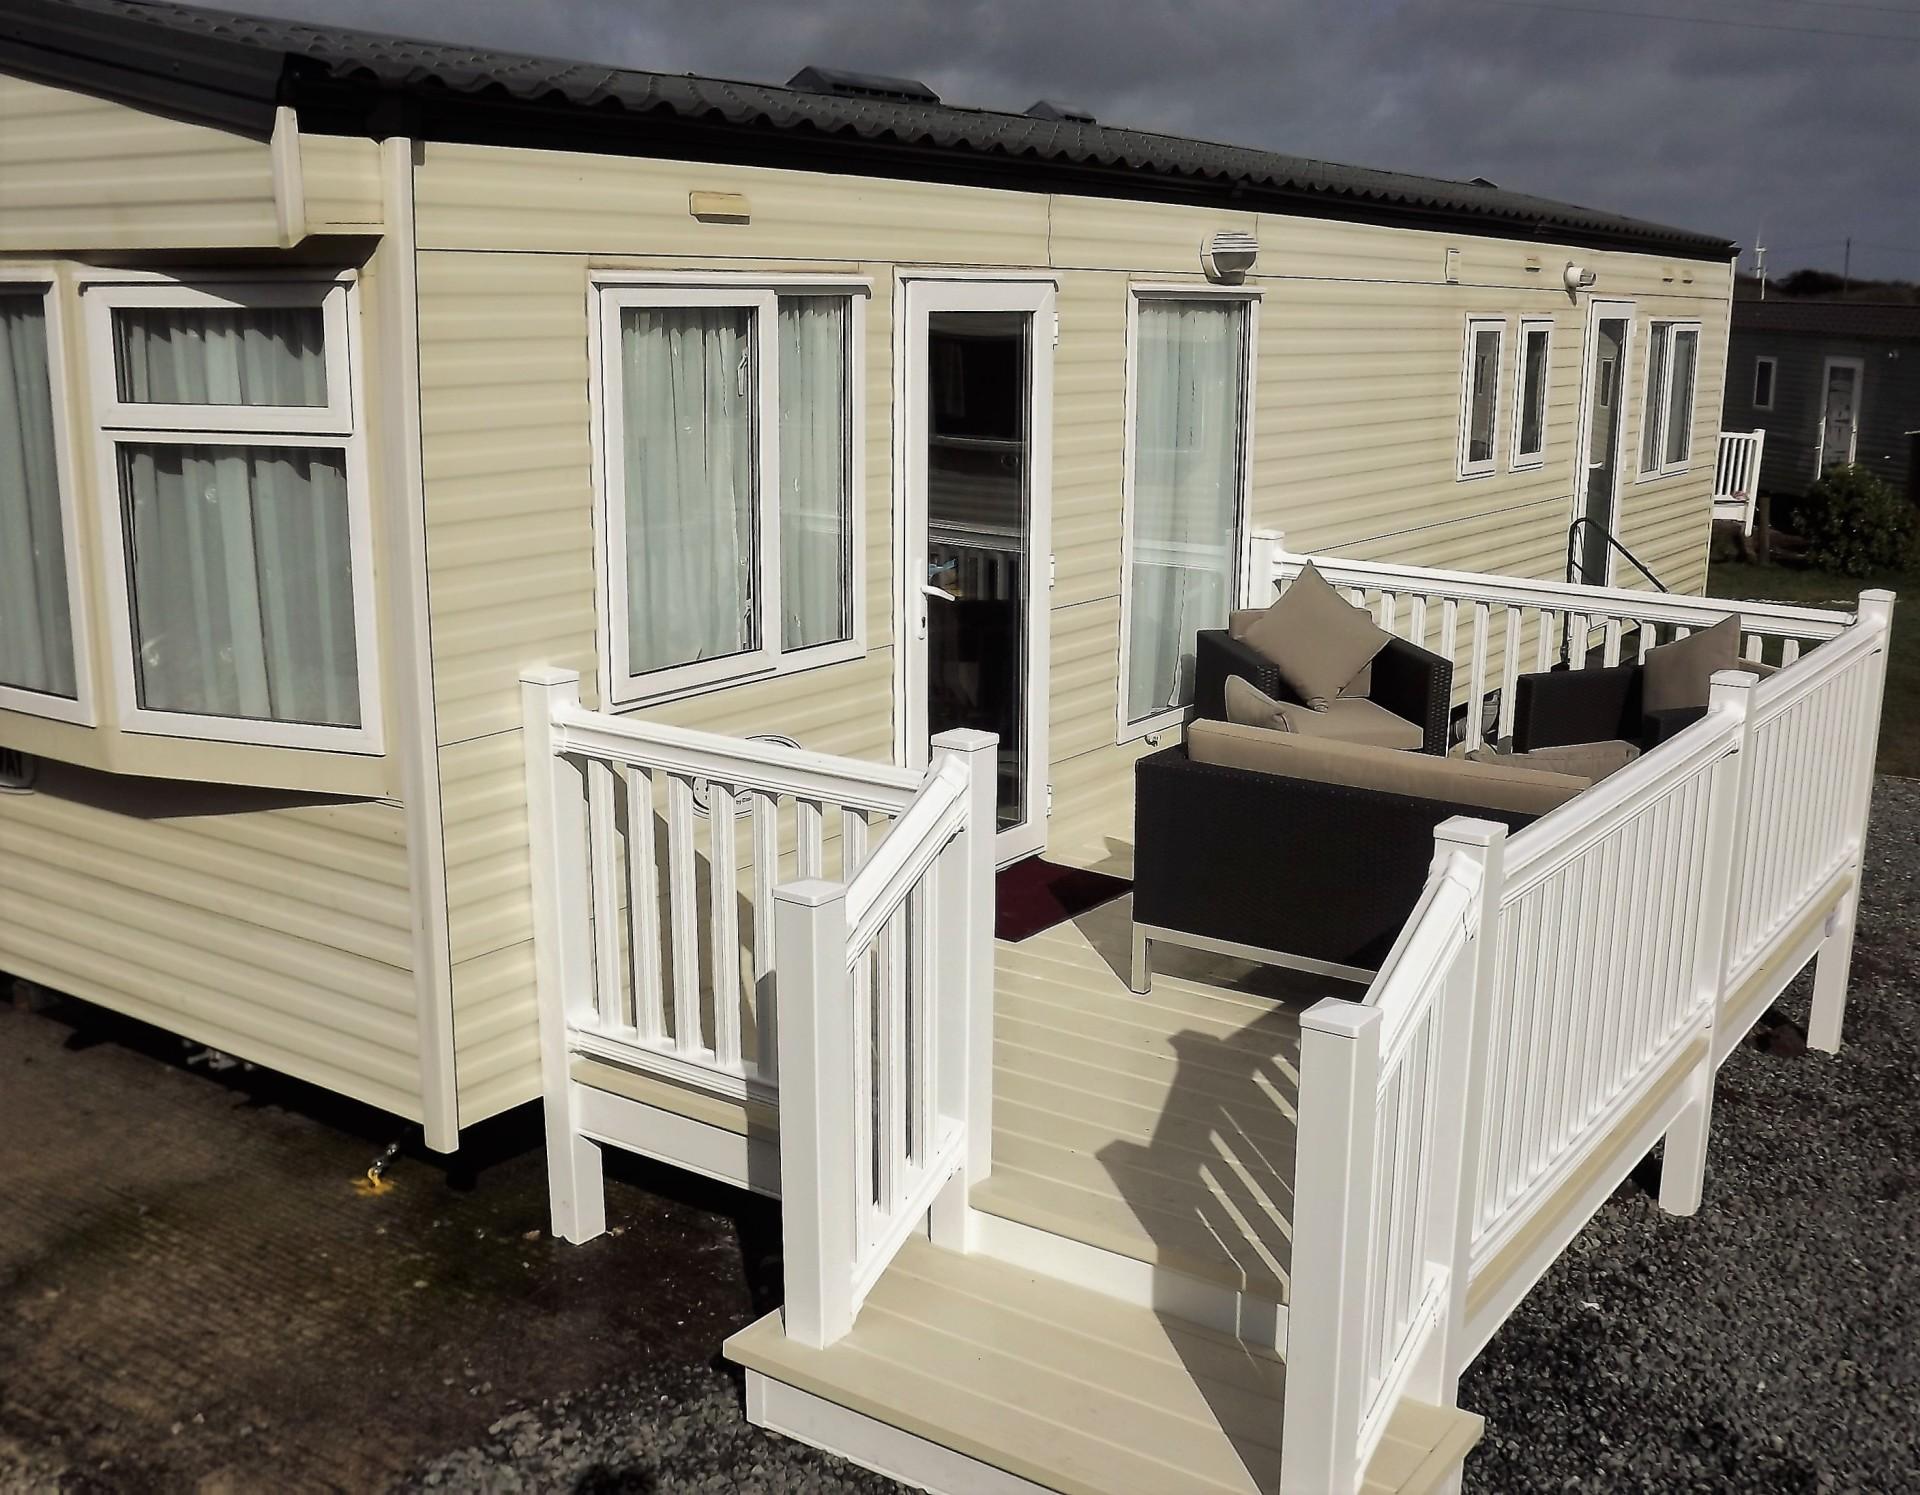 Unique Caravan For Hire At Parkdean Mullion Park In Cornwall UK Caravan Rental